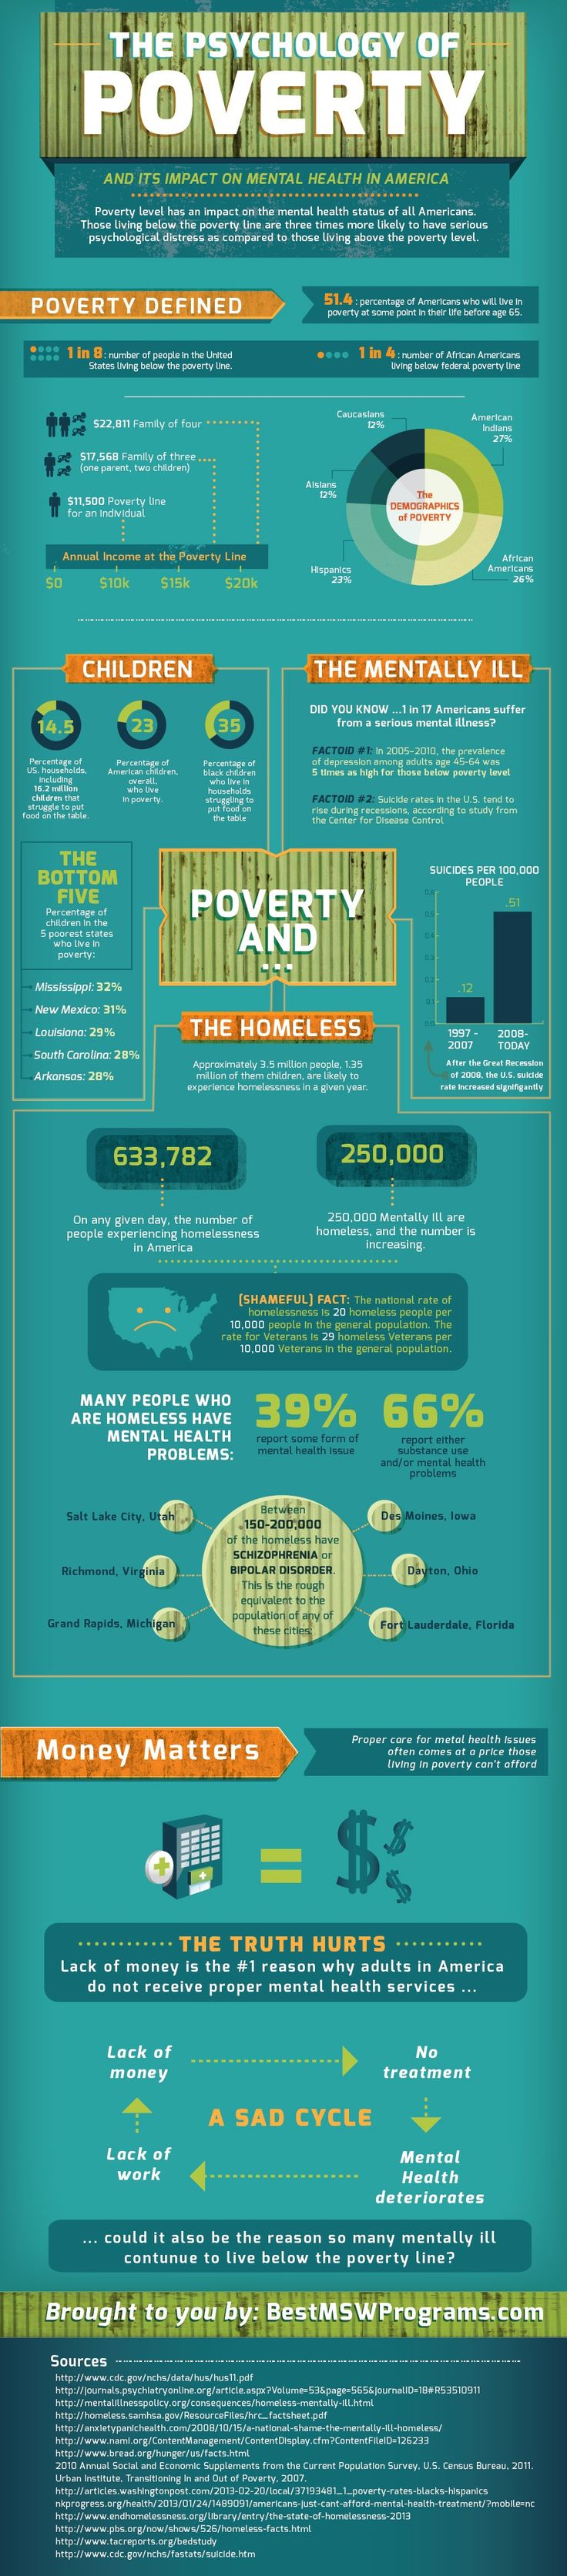 Poverty on Mental Health iNFOGRAPHiCs MANiA